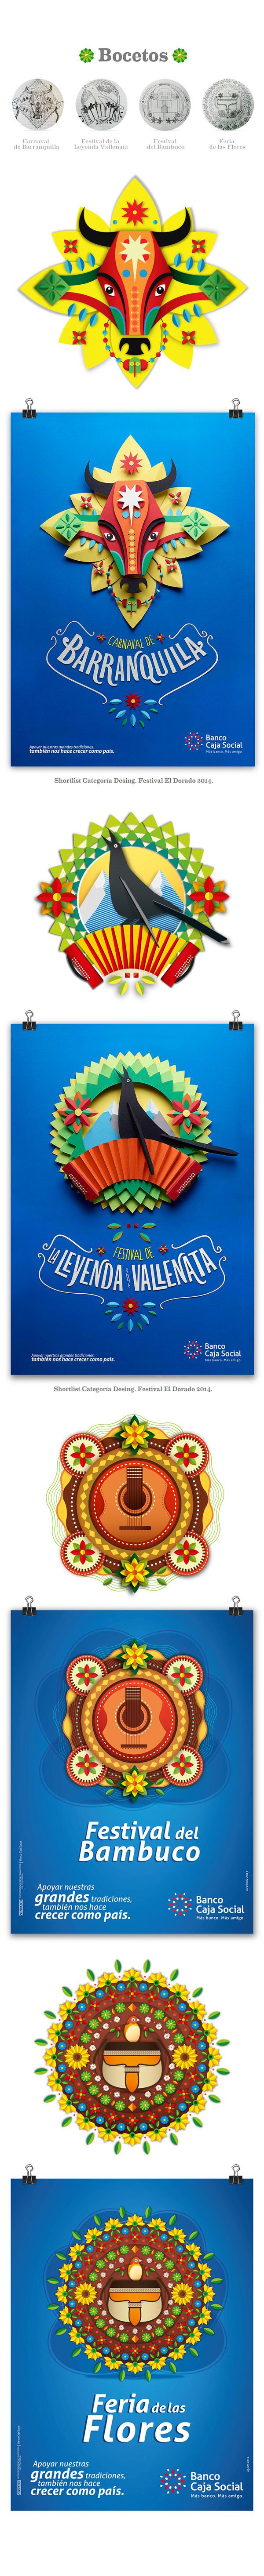 Fiestas y Ferias de Colombia BCS on Behance